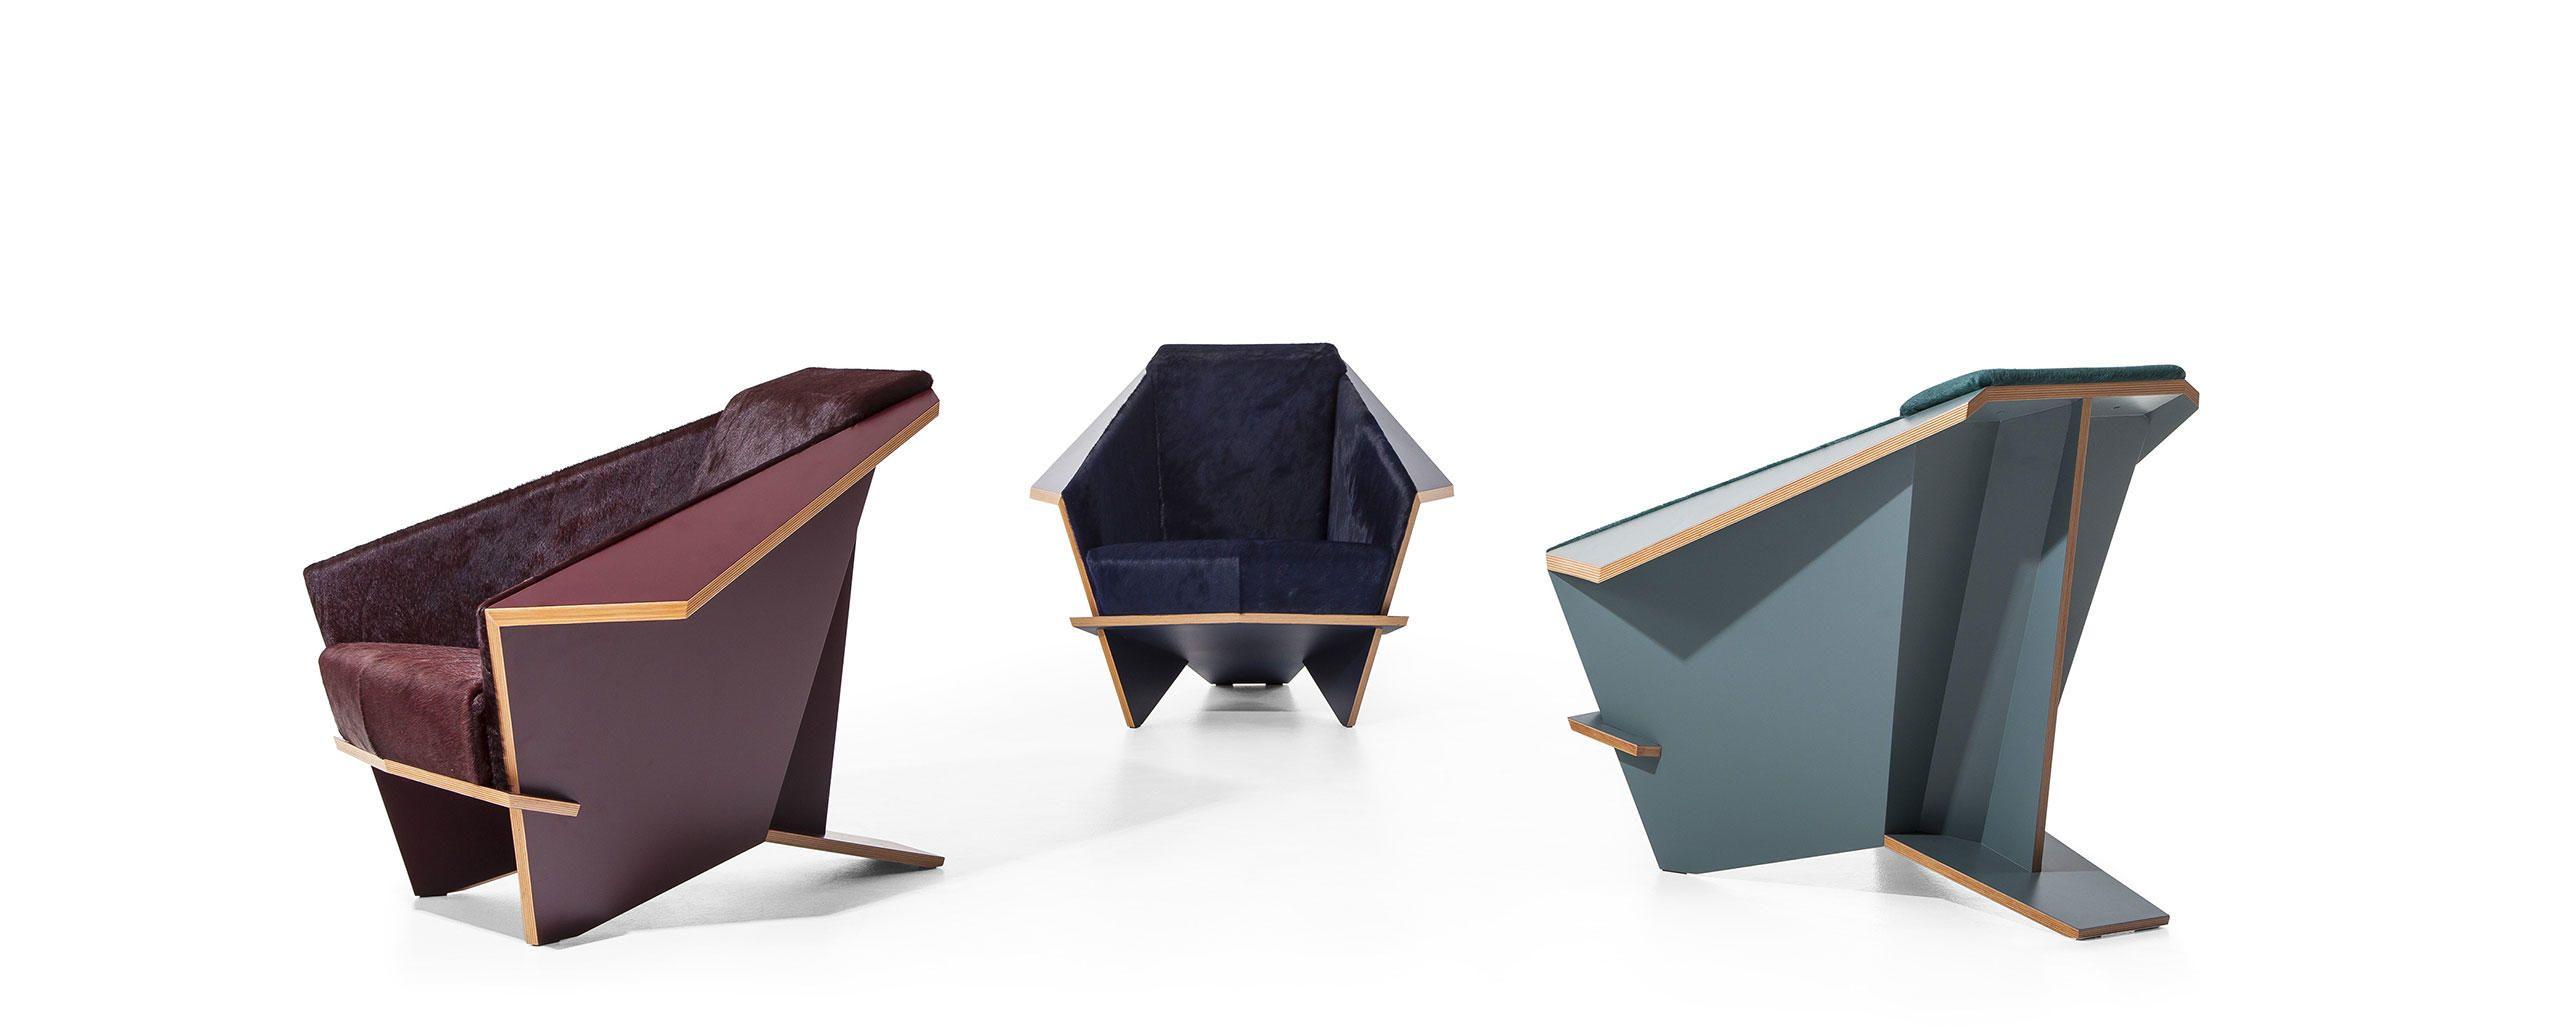 607 Taliesin 1 Armchair By Frank Lloyd Wright Cassina Italian Furniture Brands Italian Furniture Design Luxury Italian Furniture